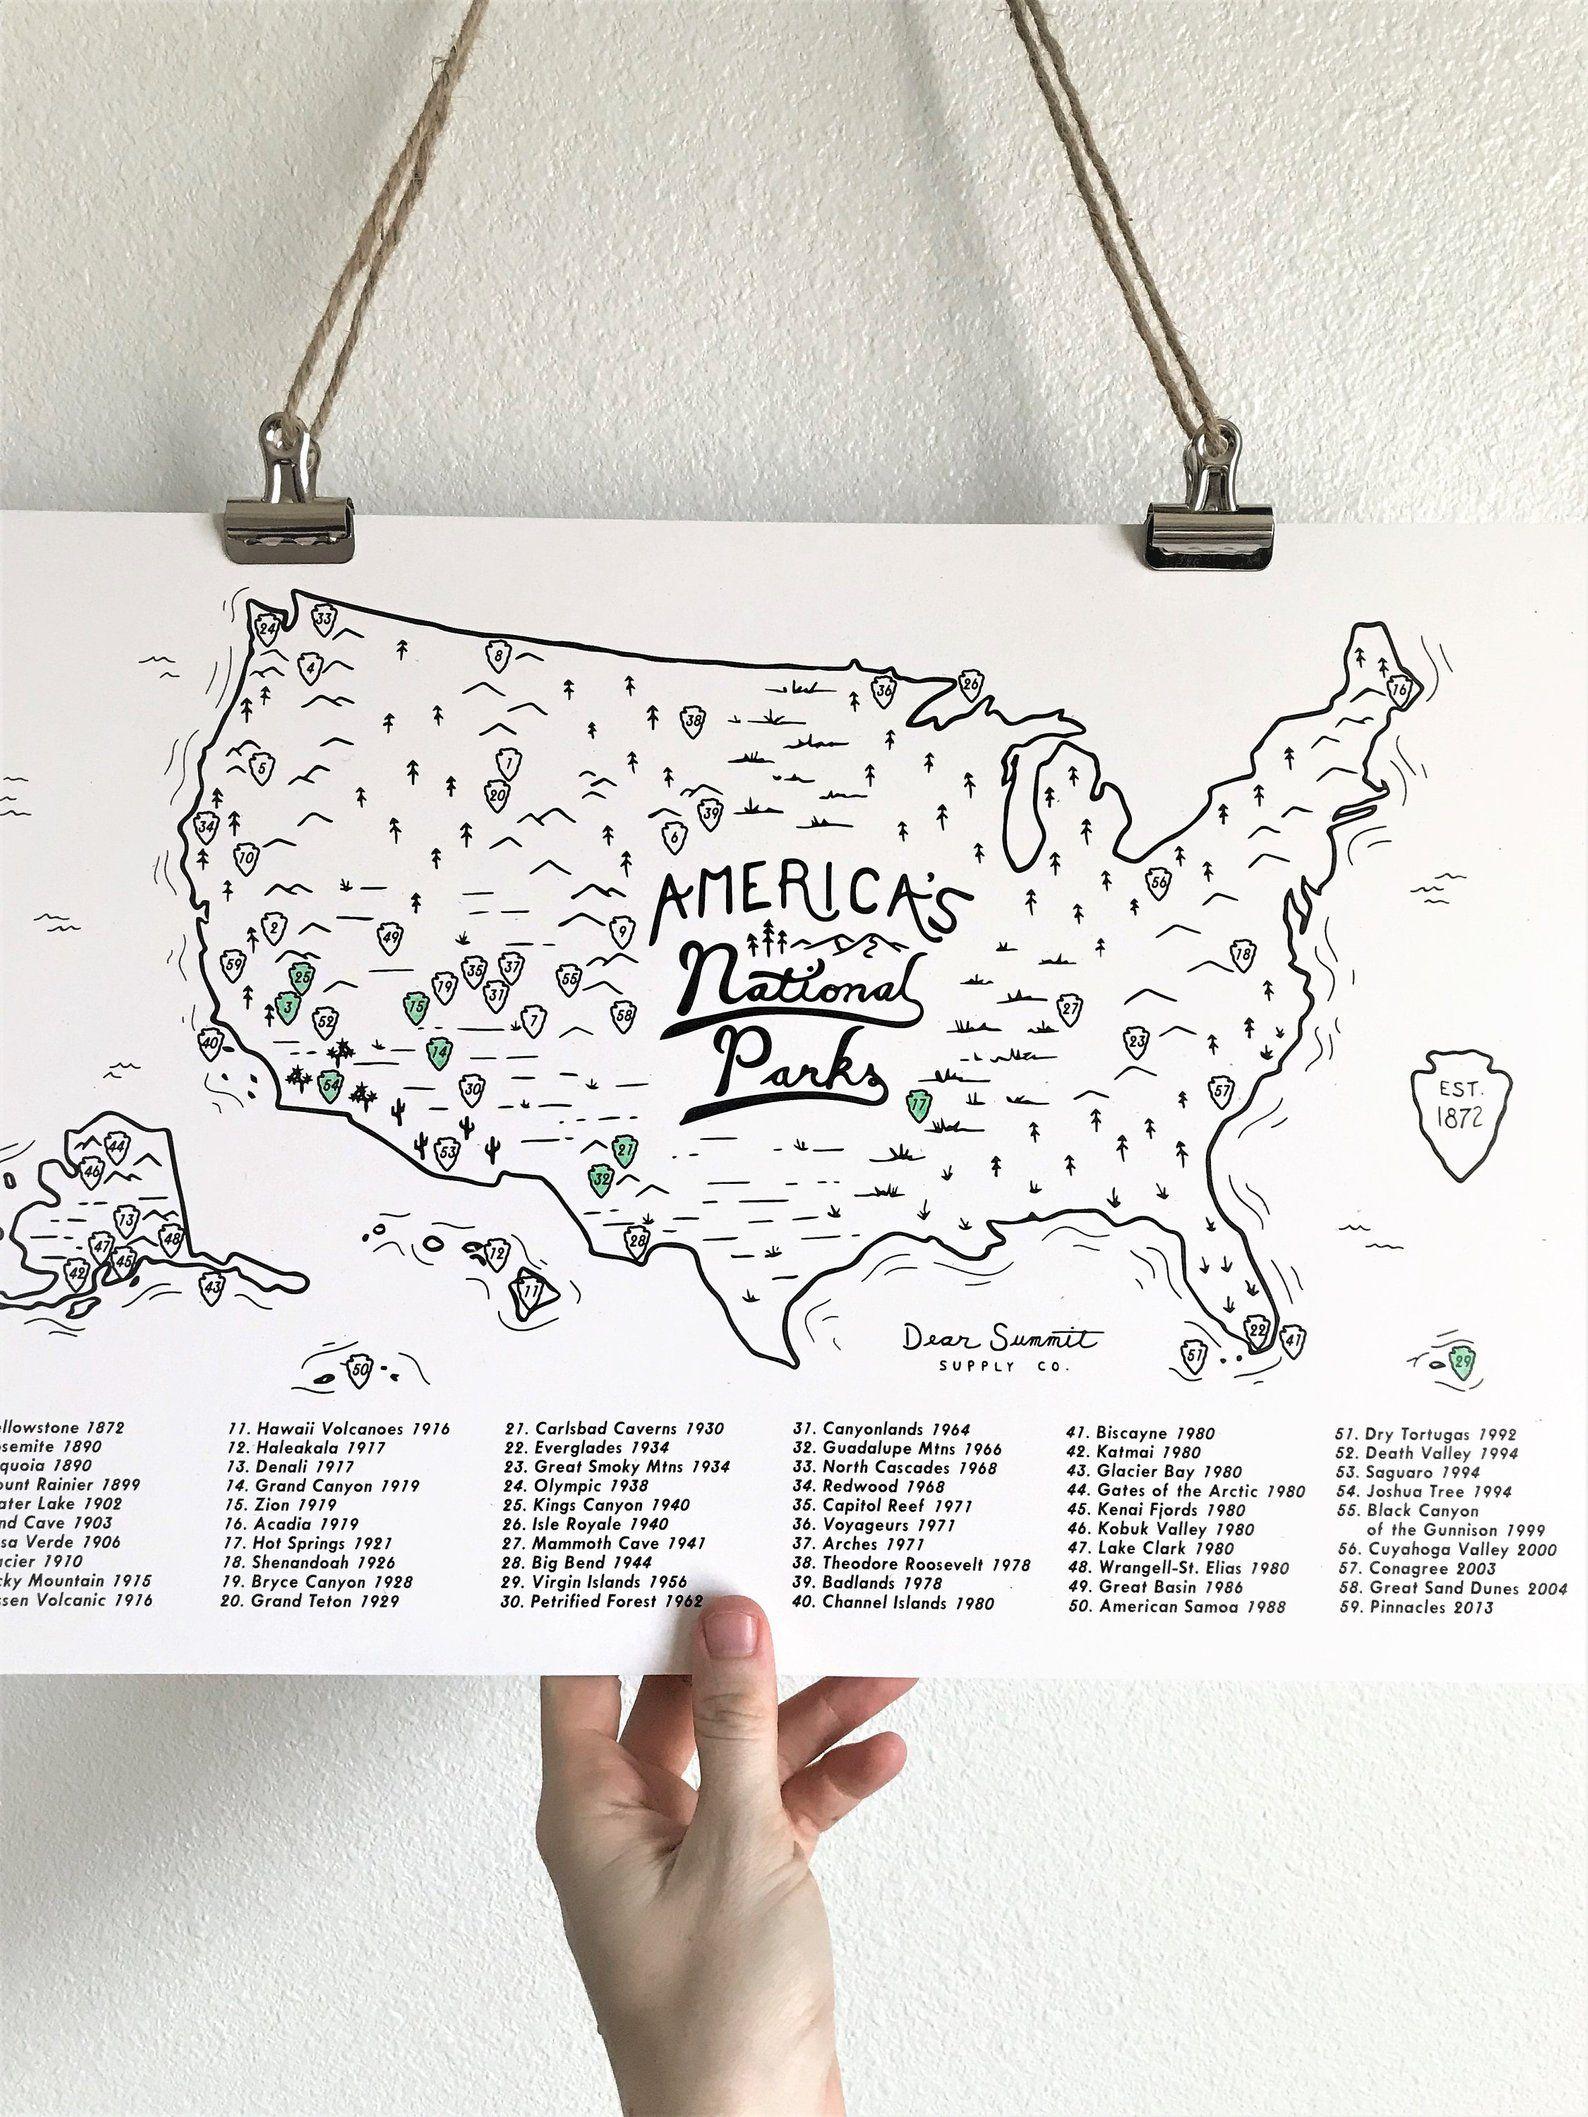 National Parks Map Checklist Map National Park Poster Etsy In 2020 National Park Posters National Parks Map National Parks Usa